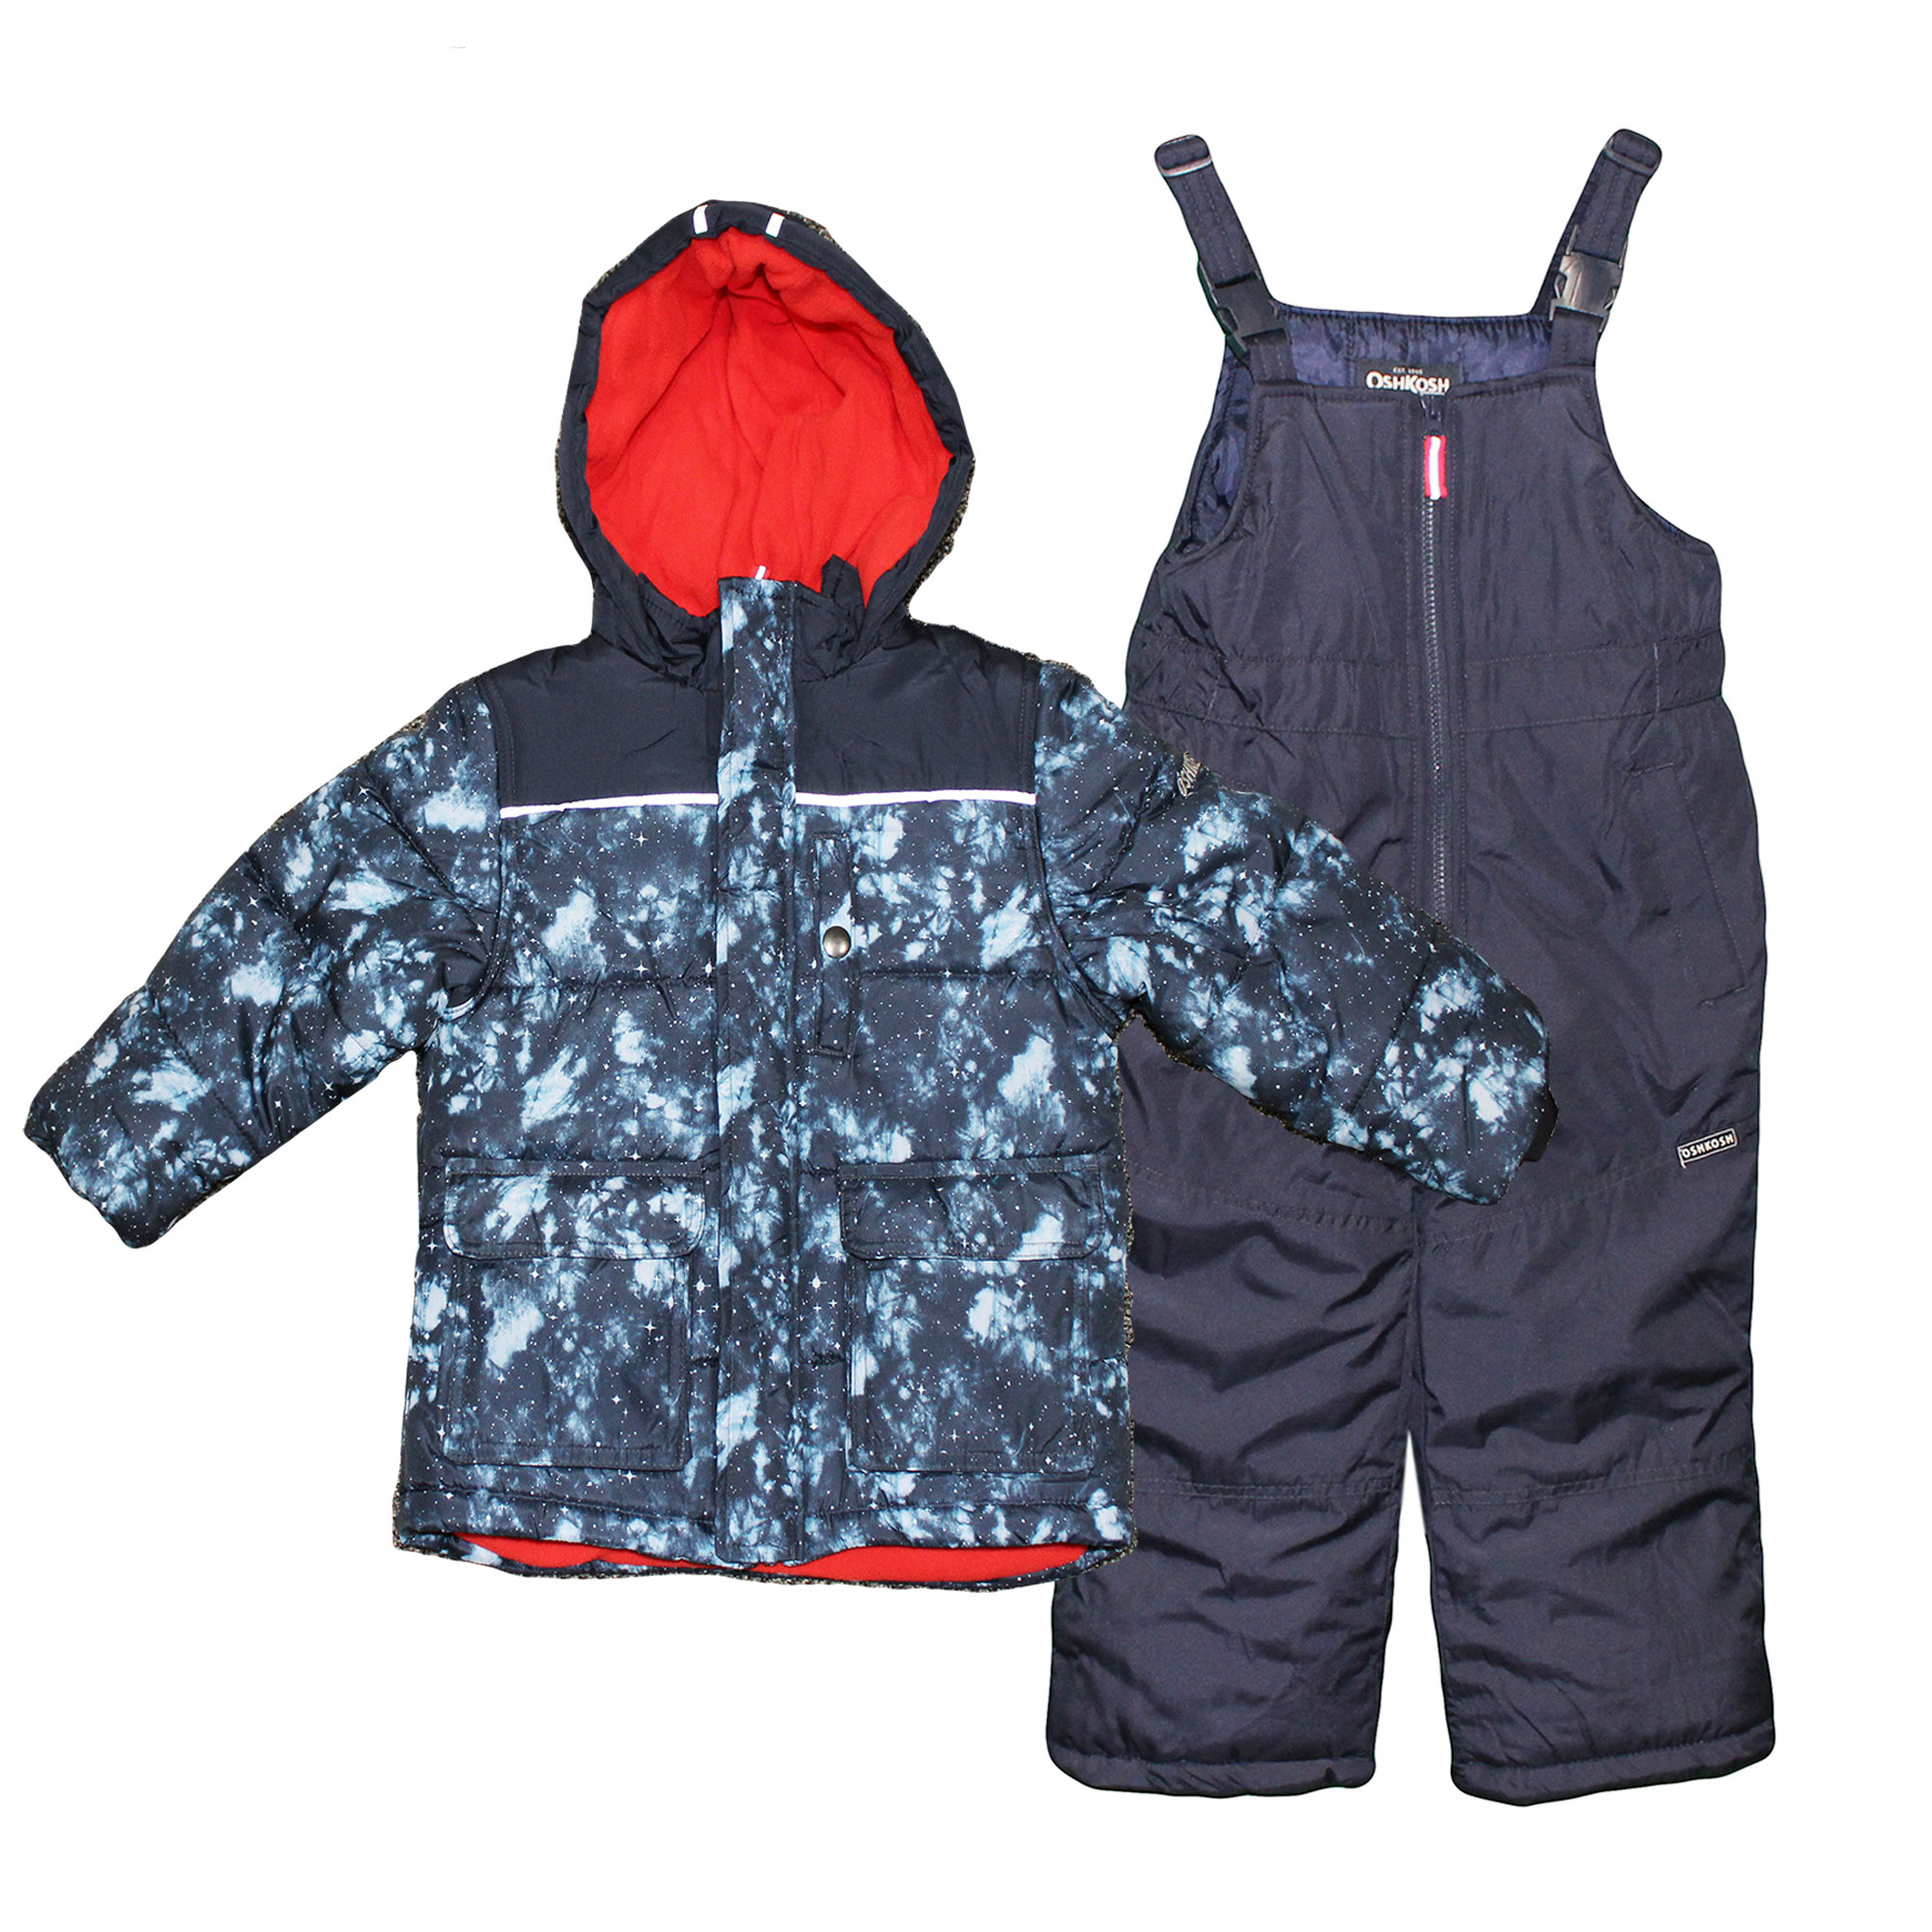 Osh Kosh B/'gosh Toddler Boys Red /& Blue Fleece Lined Jacket Size 2T 3T 4T